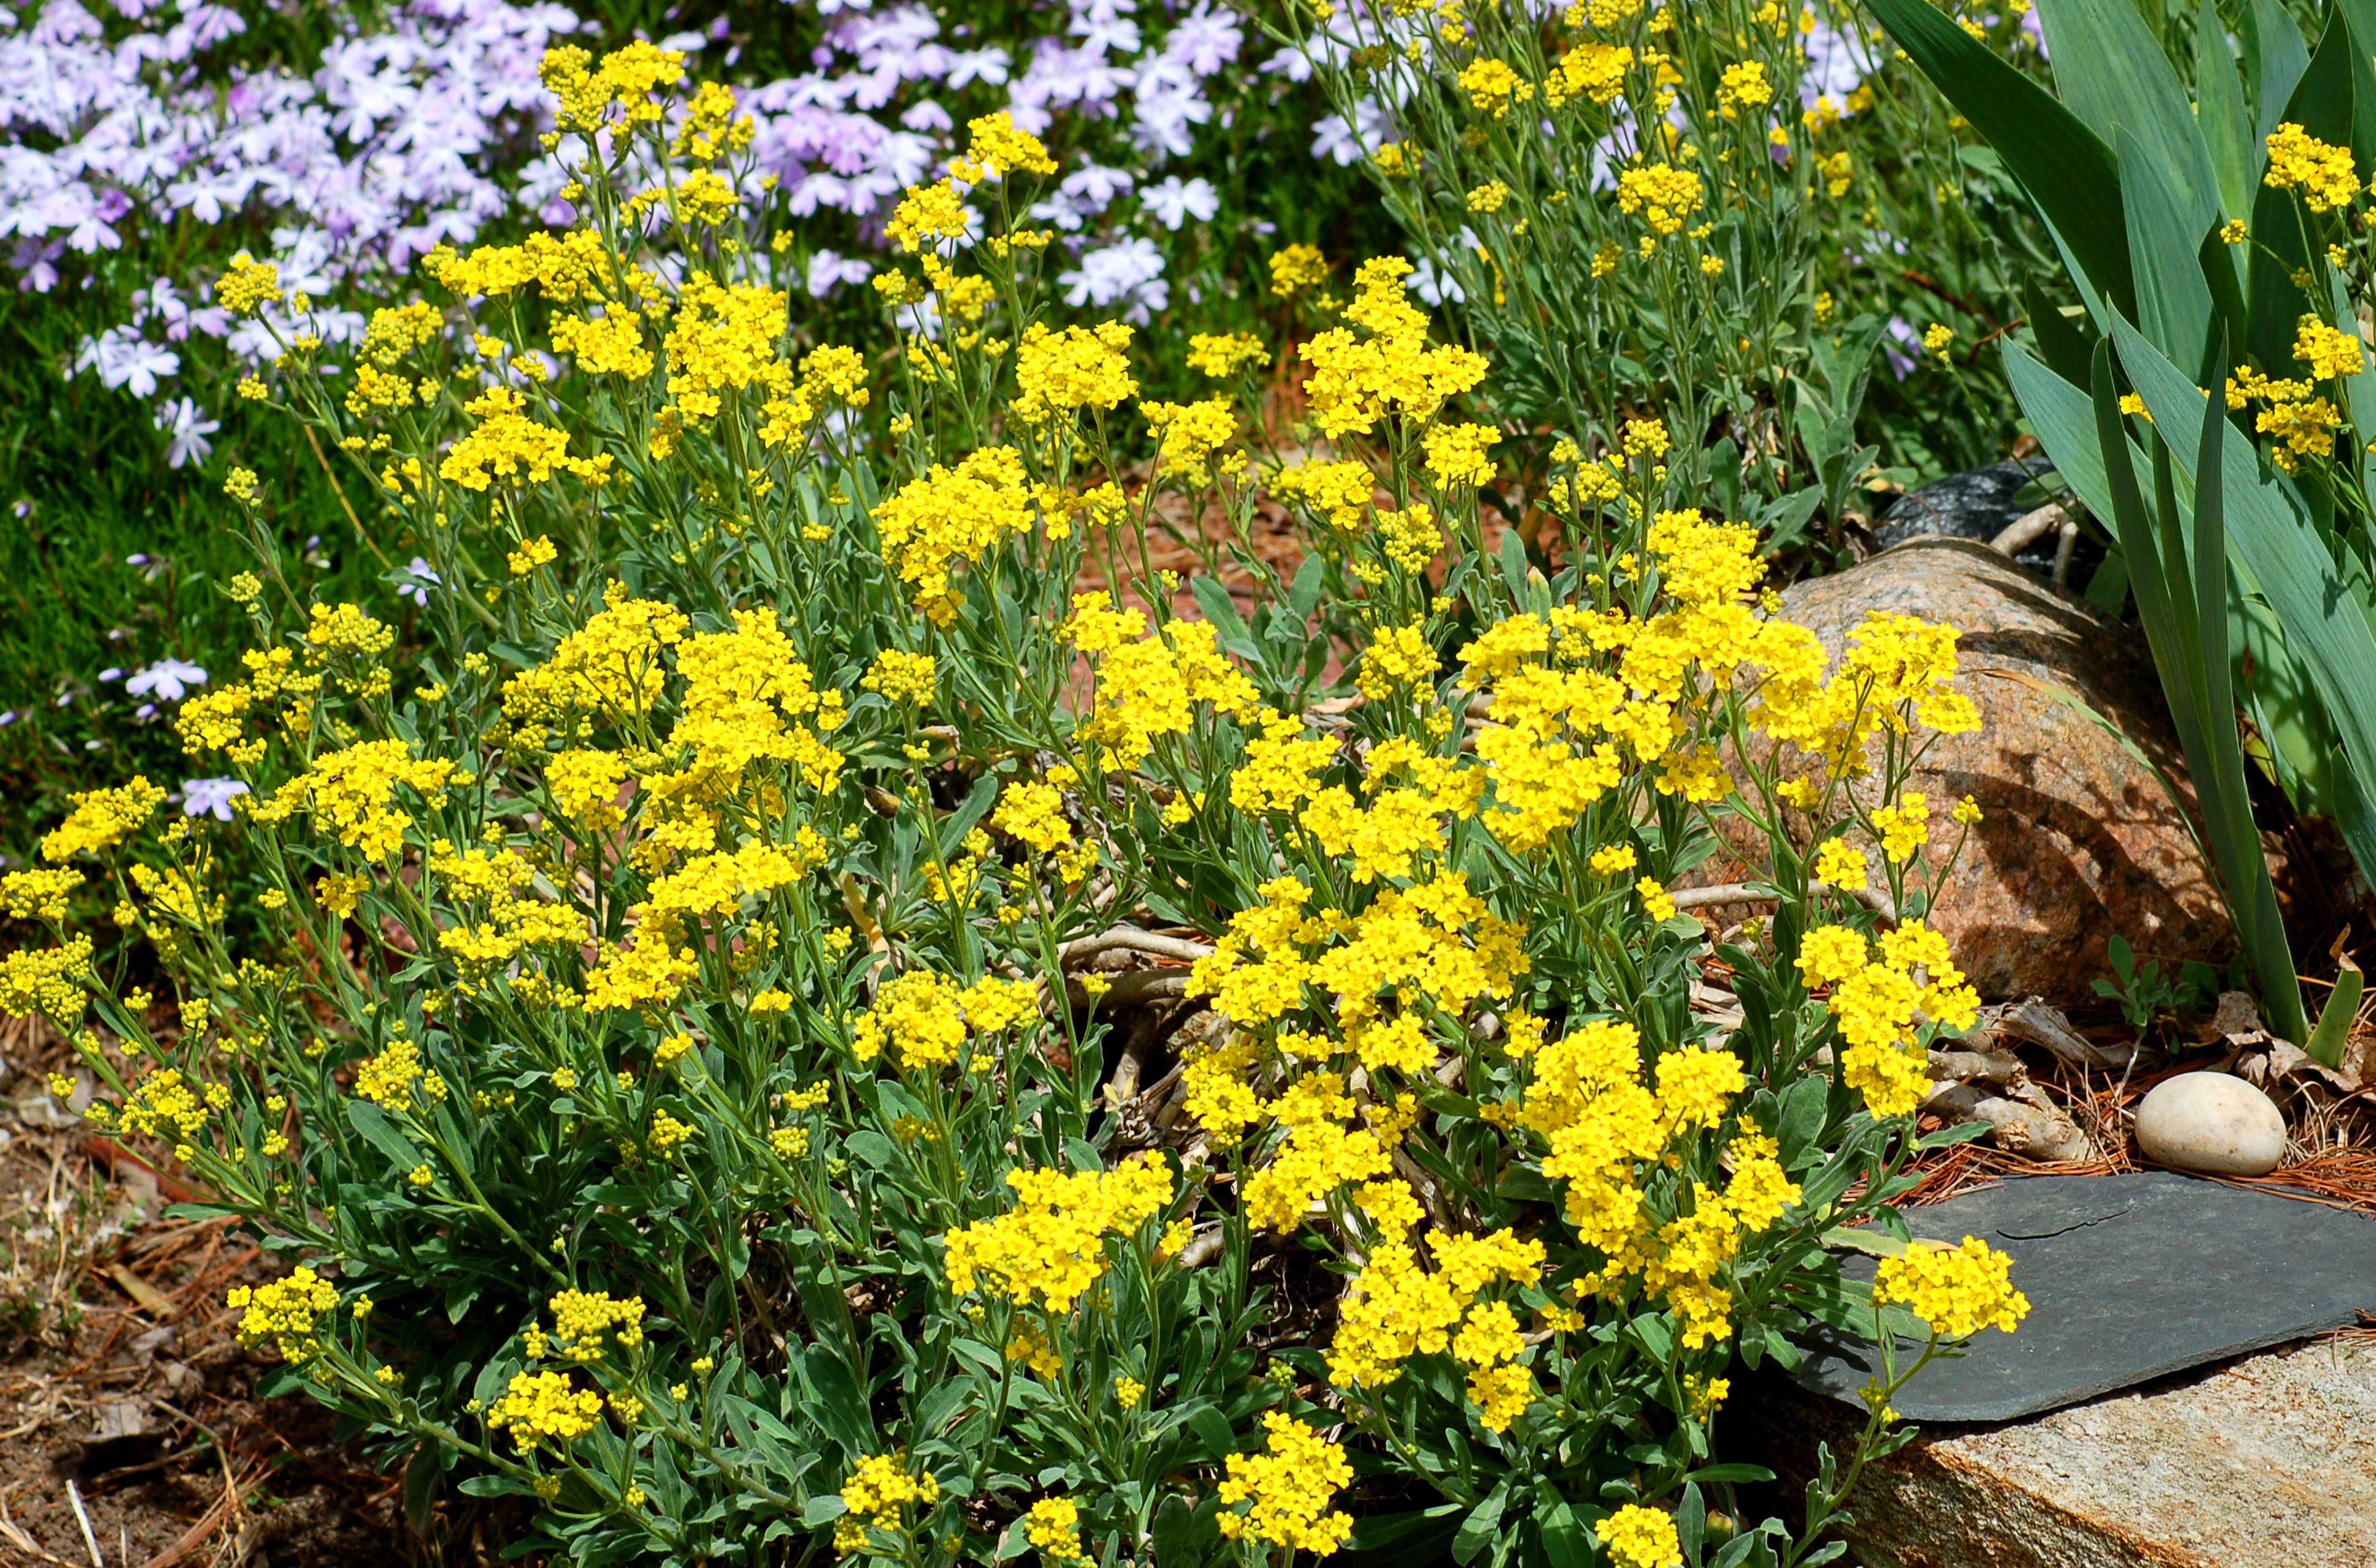 Yellow alyssum flowers amid phlox flowers and rocks.